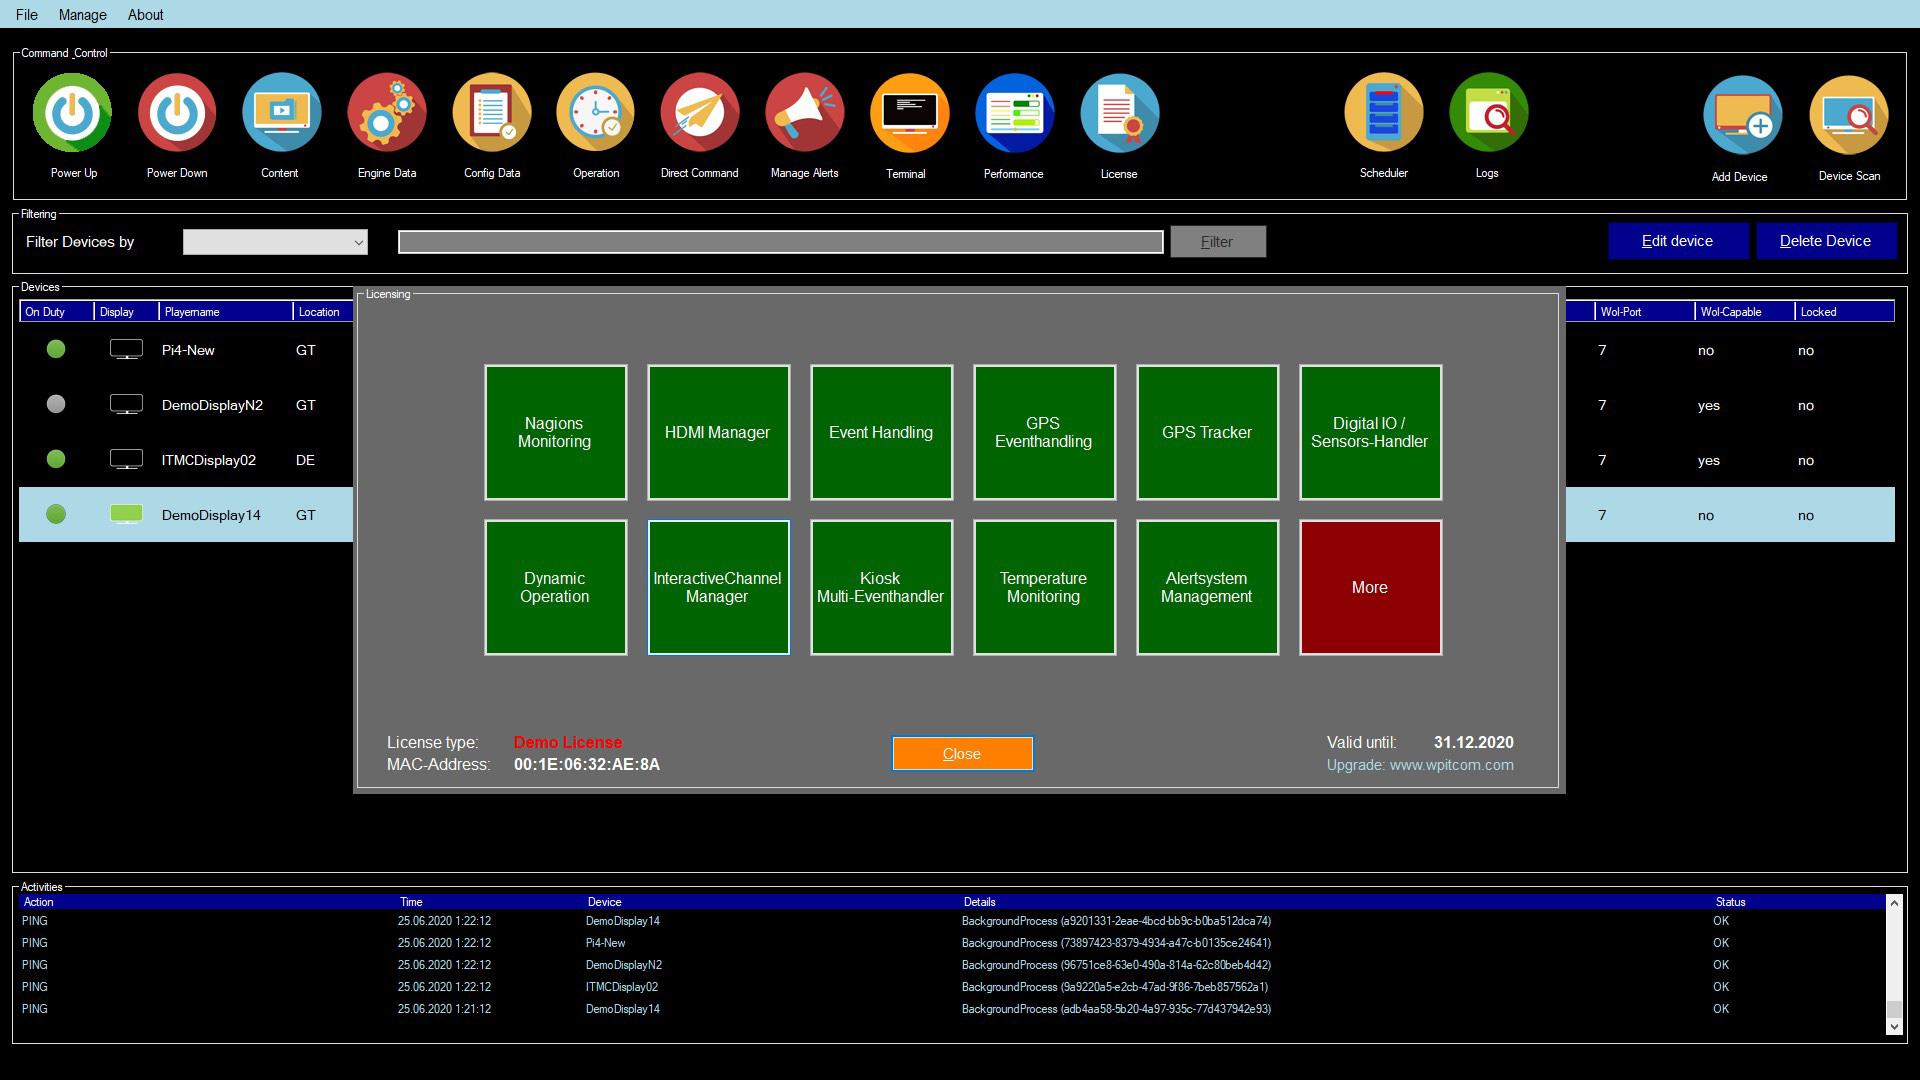 WPITCOM Display Manager Licensing Information